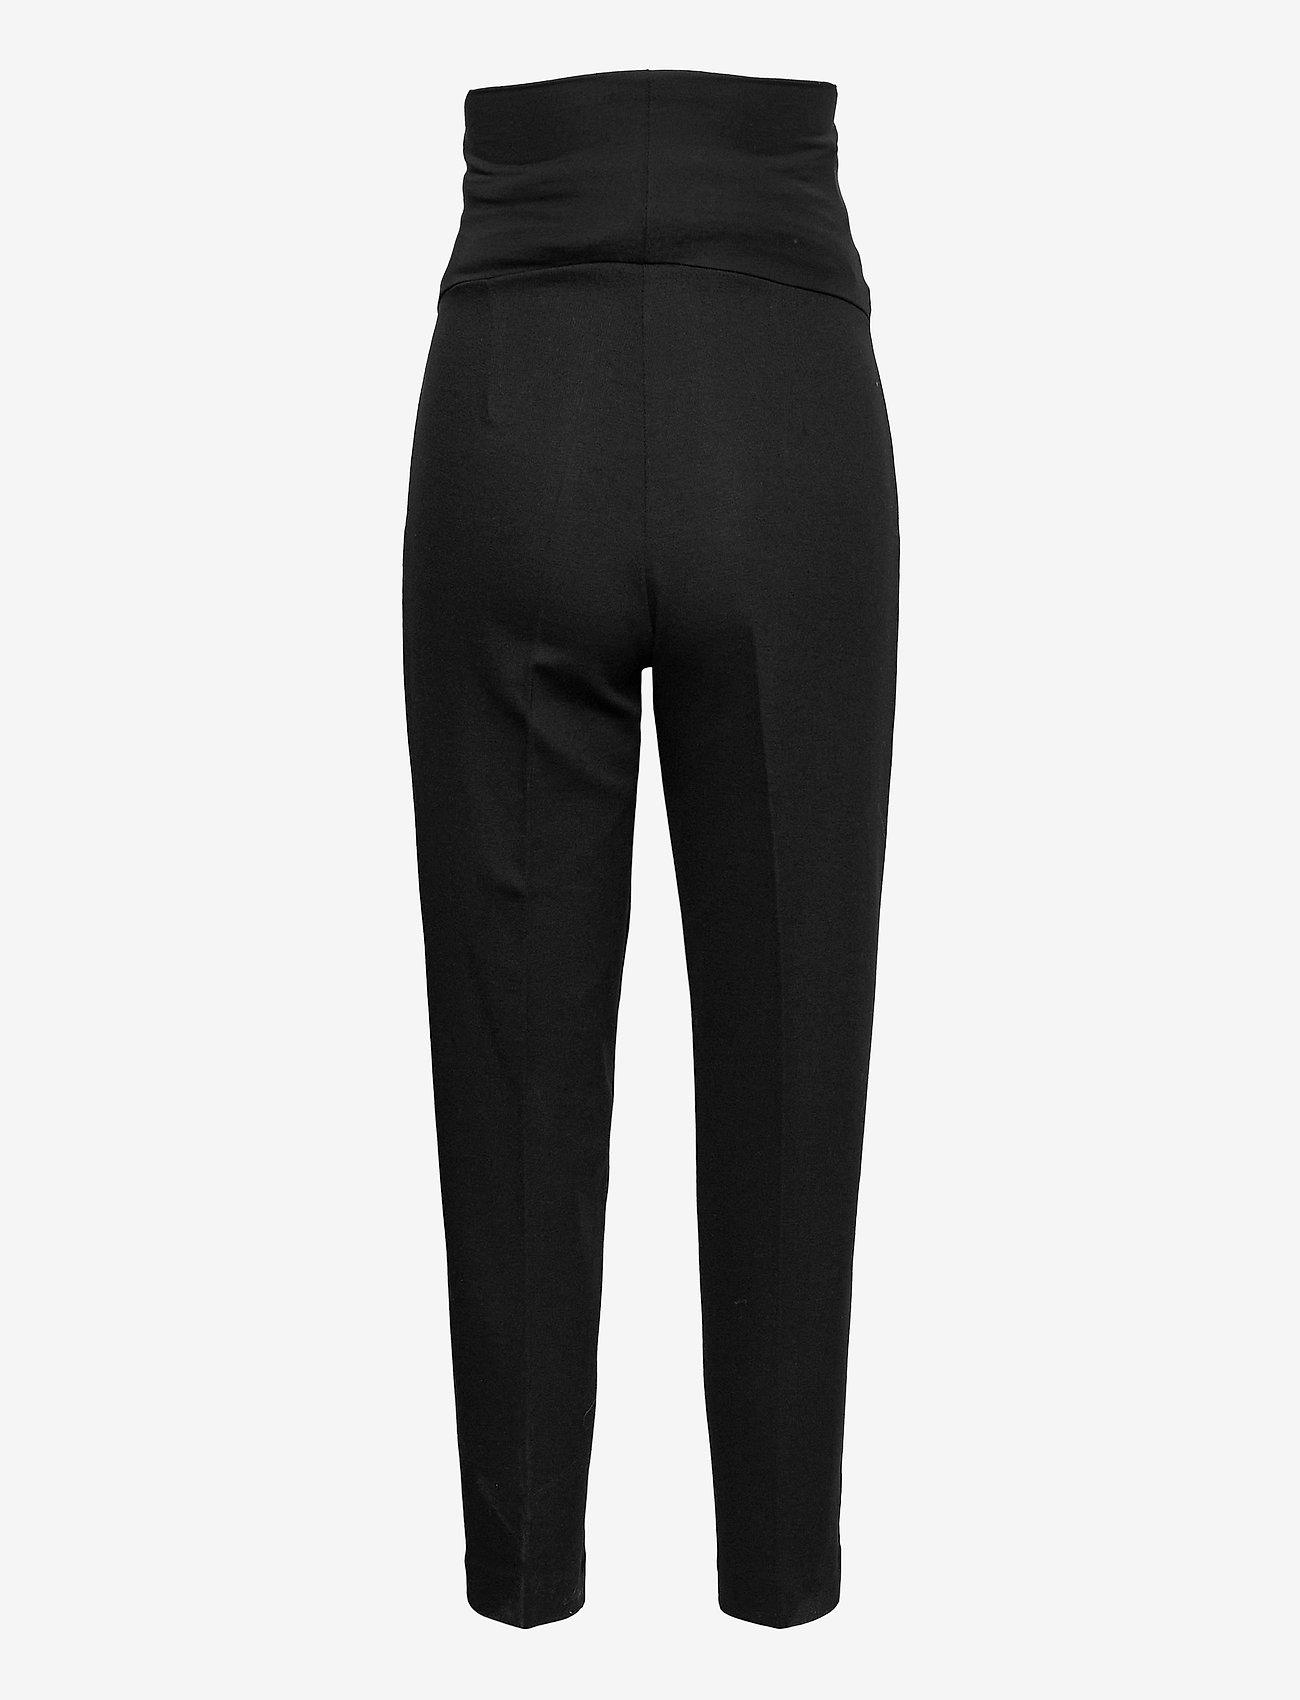 Boob - OONO cropped slacks - casual bukser - black - 2